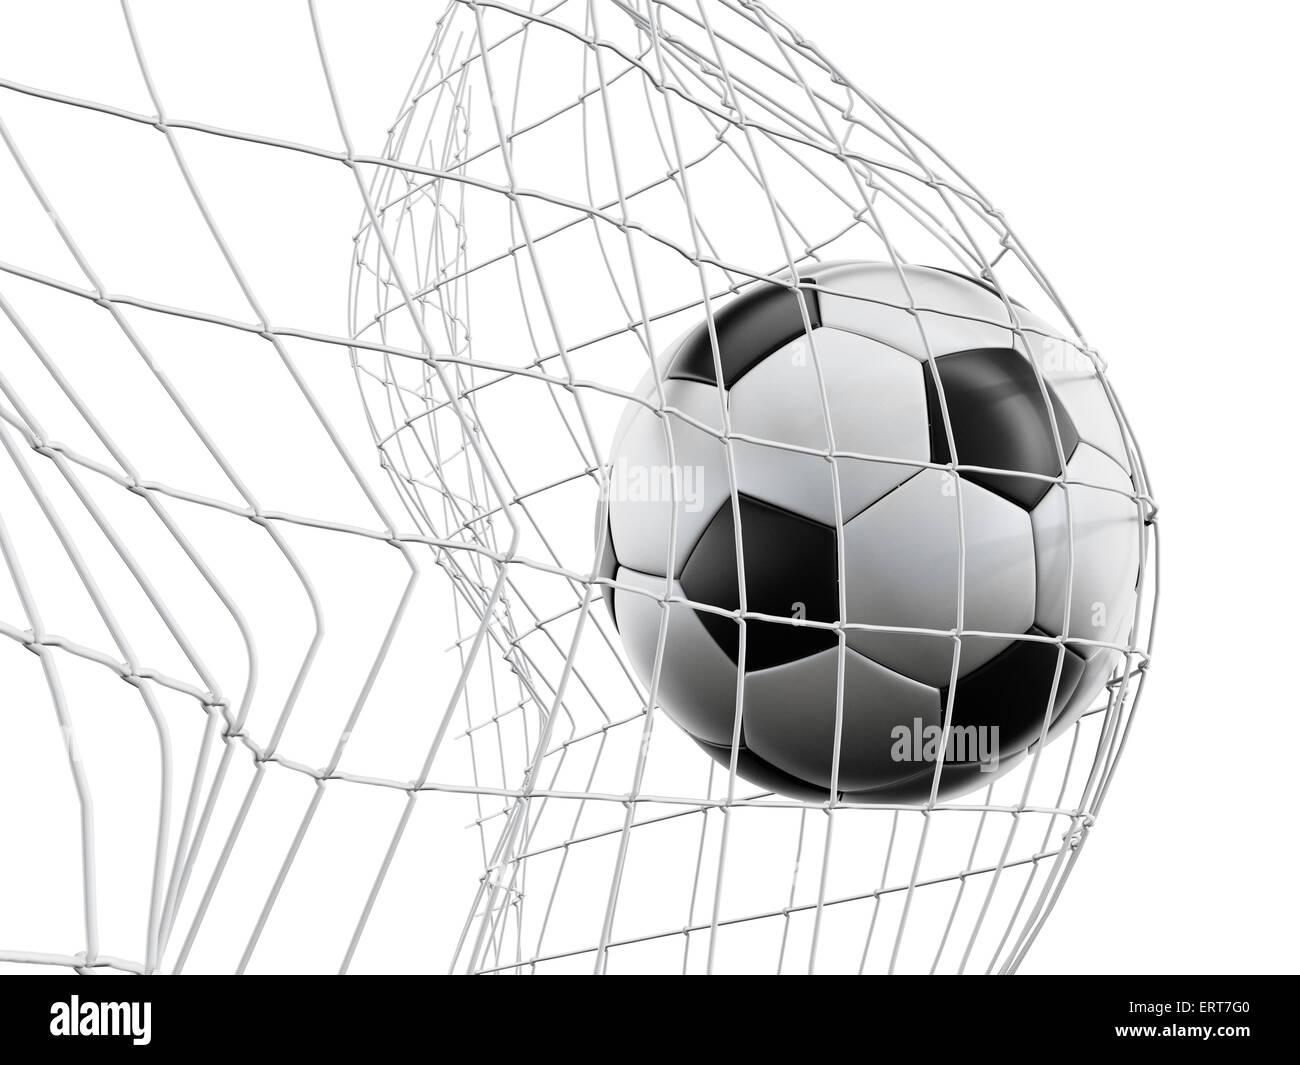 Balón de fútbol o fútbol en la red aislada sobre fondo blanco. Imagen De Stock